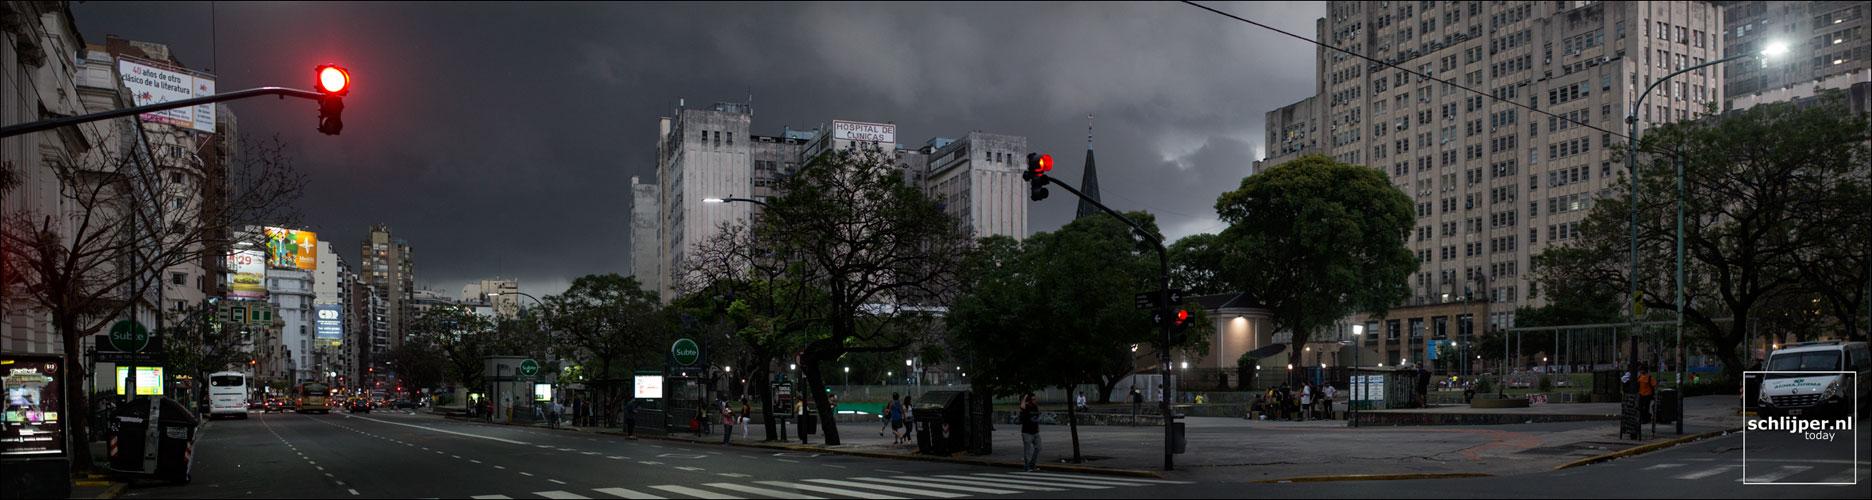 Argentinie, Buenos Aires, 29 november 2014